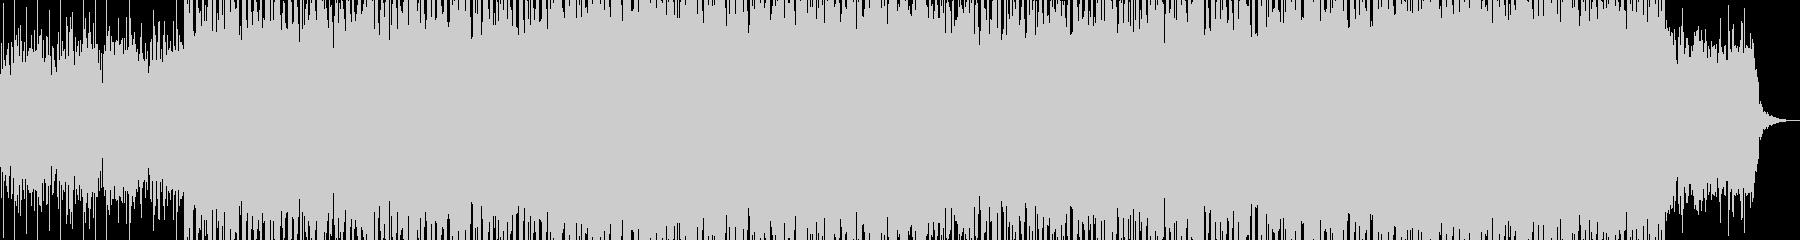 EDMポップで明るいクラブ系-111の未再生の波形